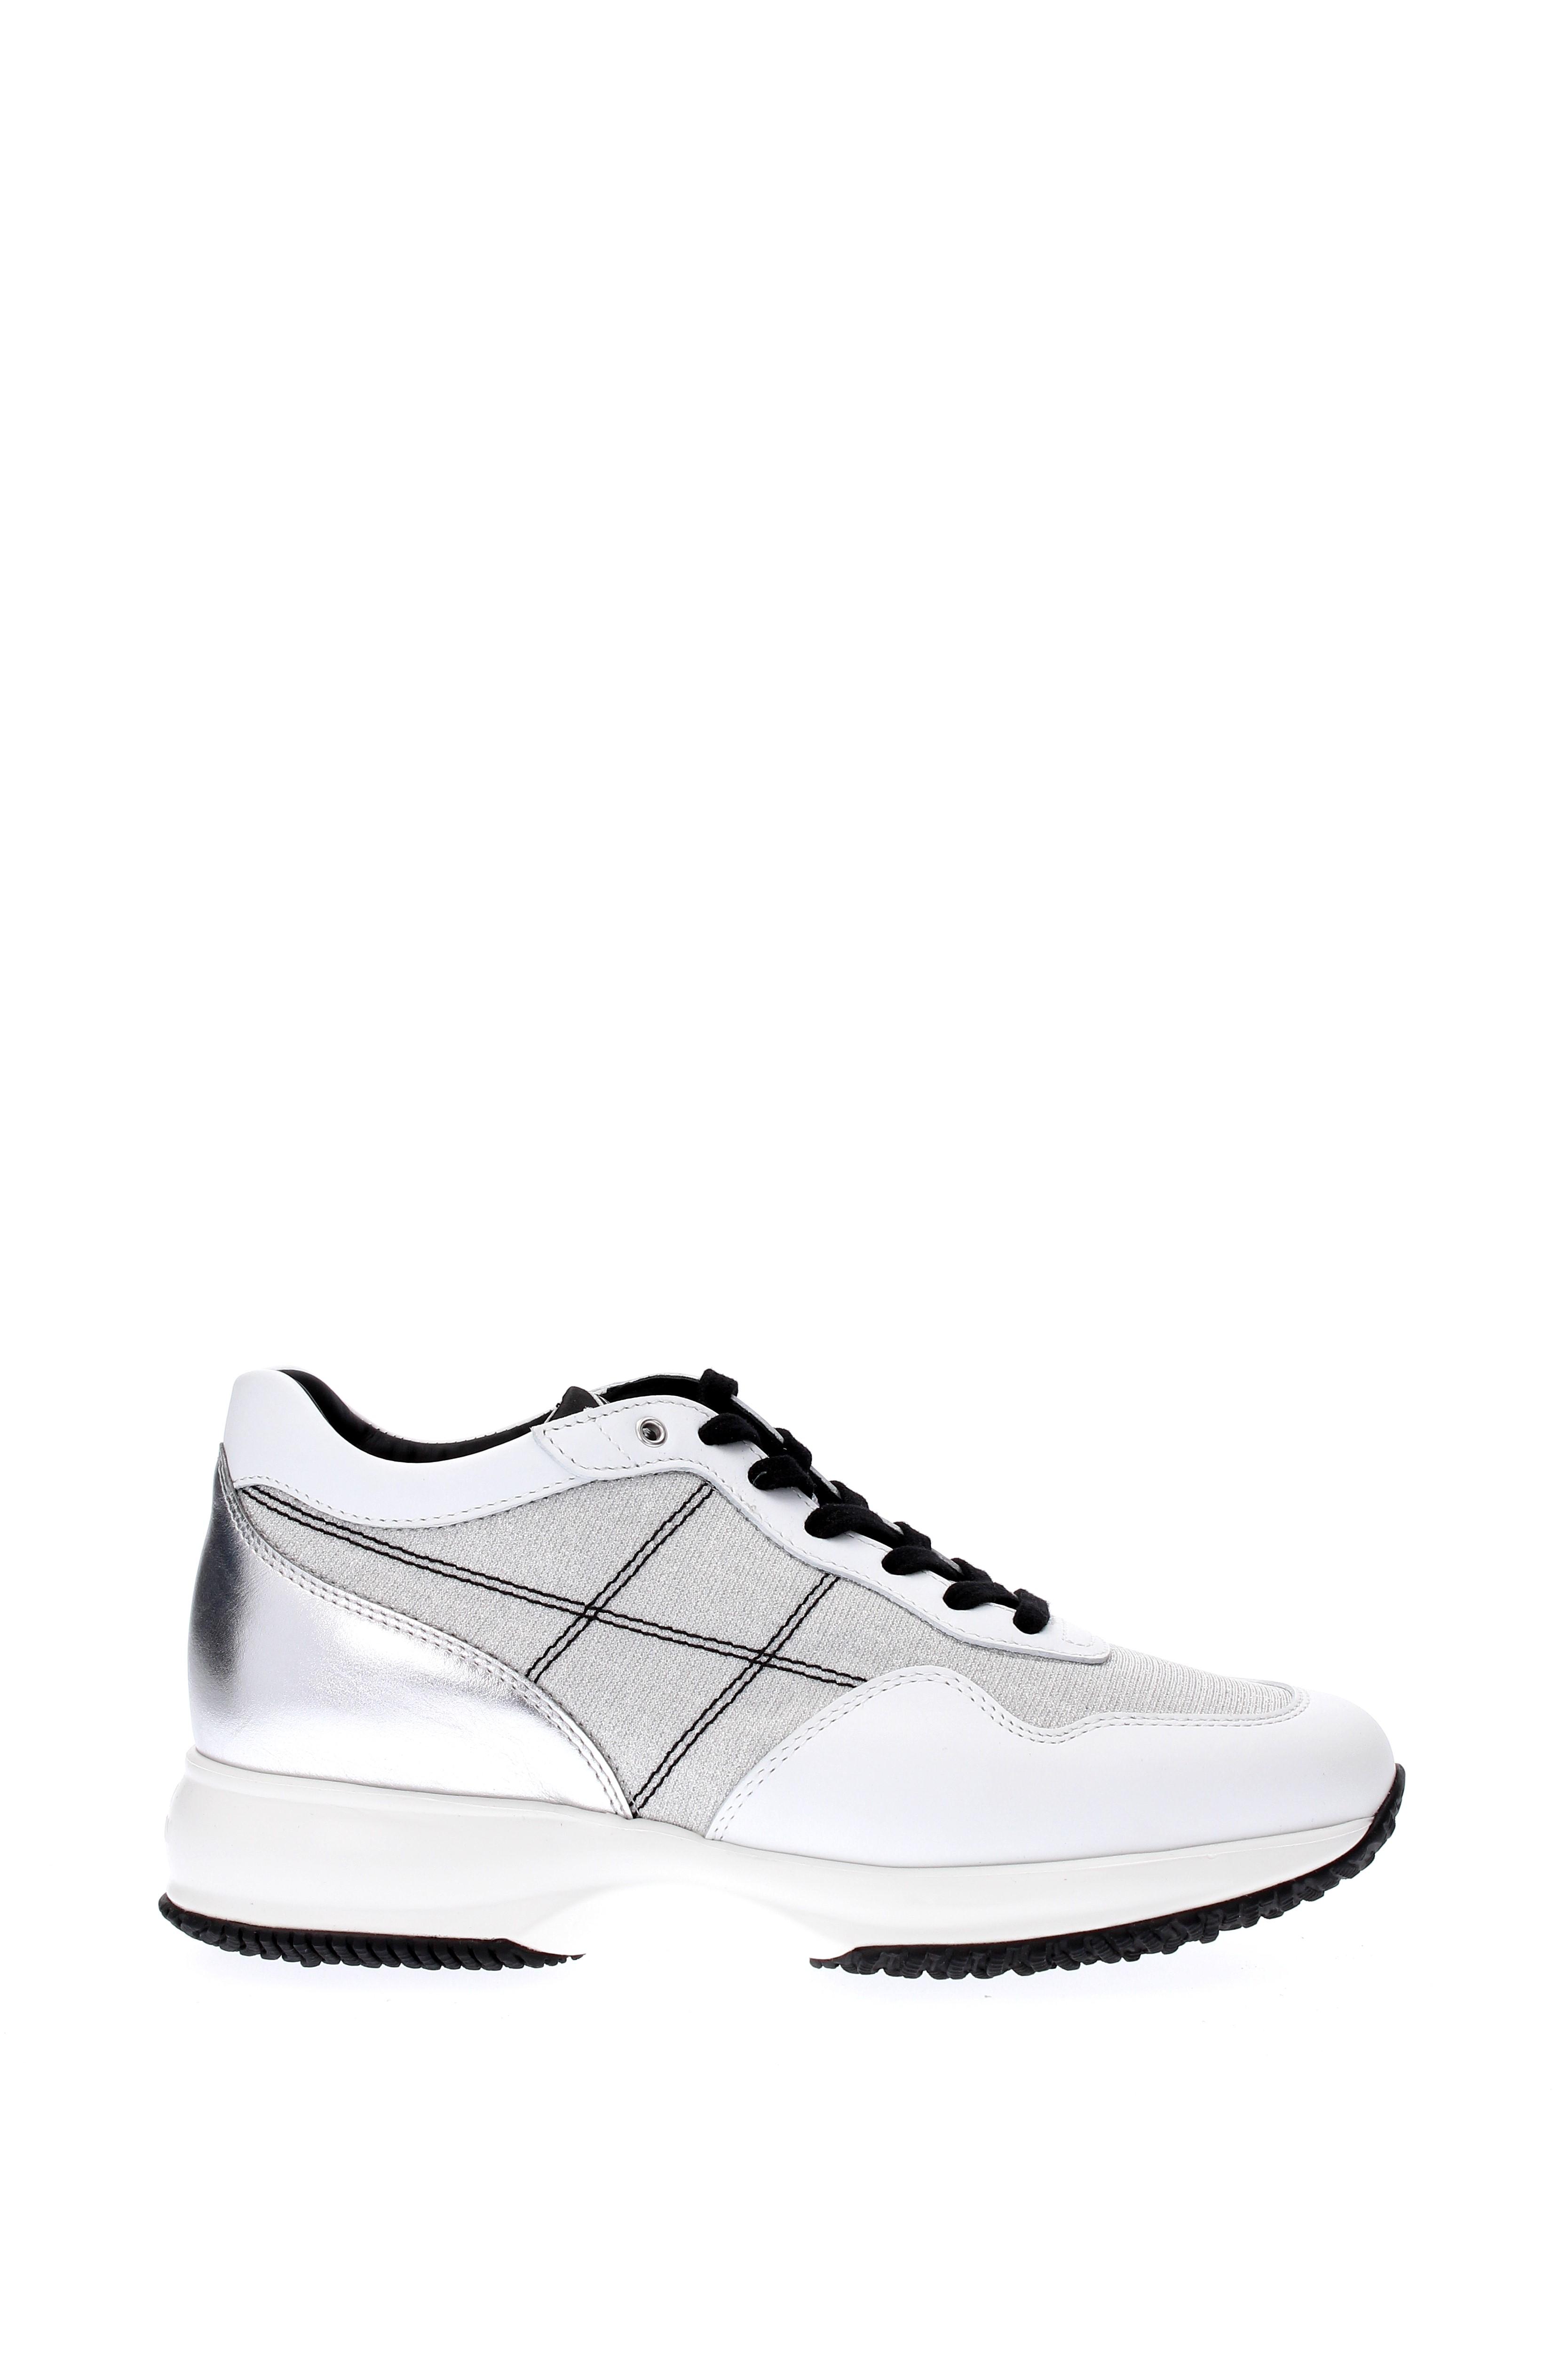 Sneakers Hogan interactive interactive interactive Damen - Stoff (HXW00N0K010J18) 9d5c1f